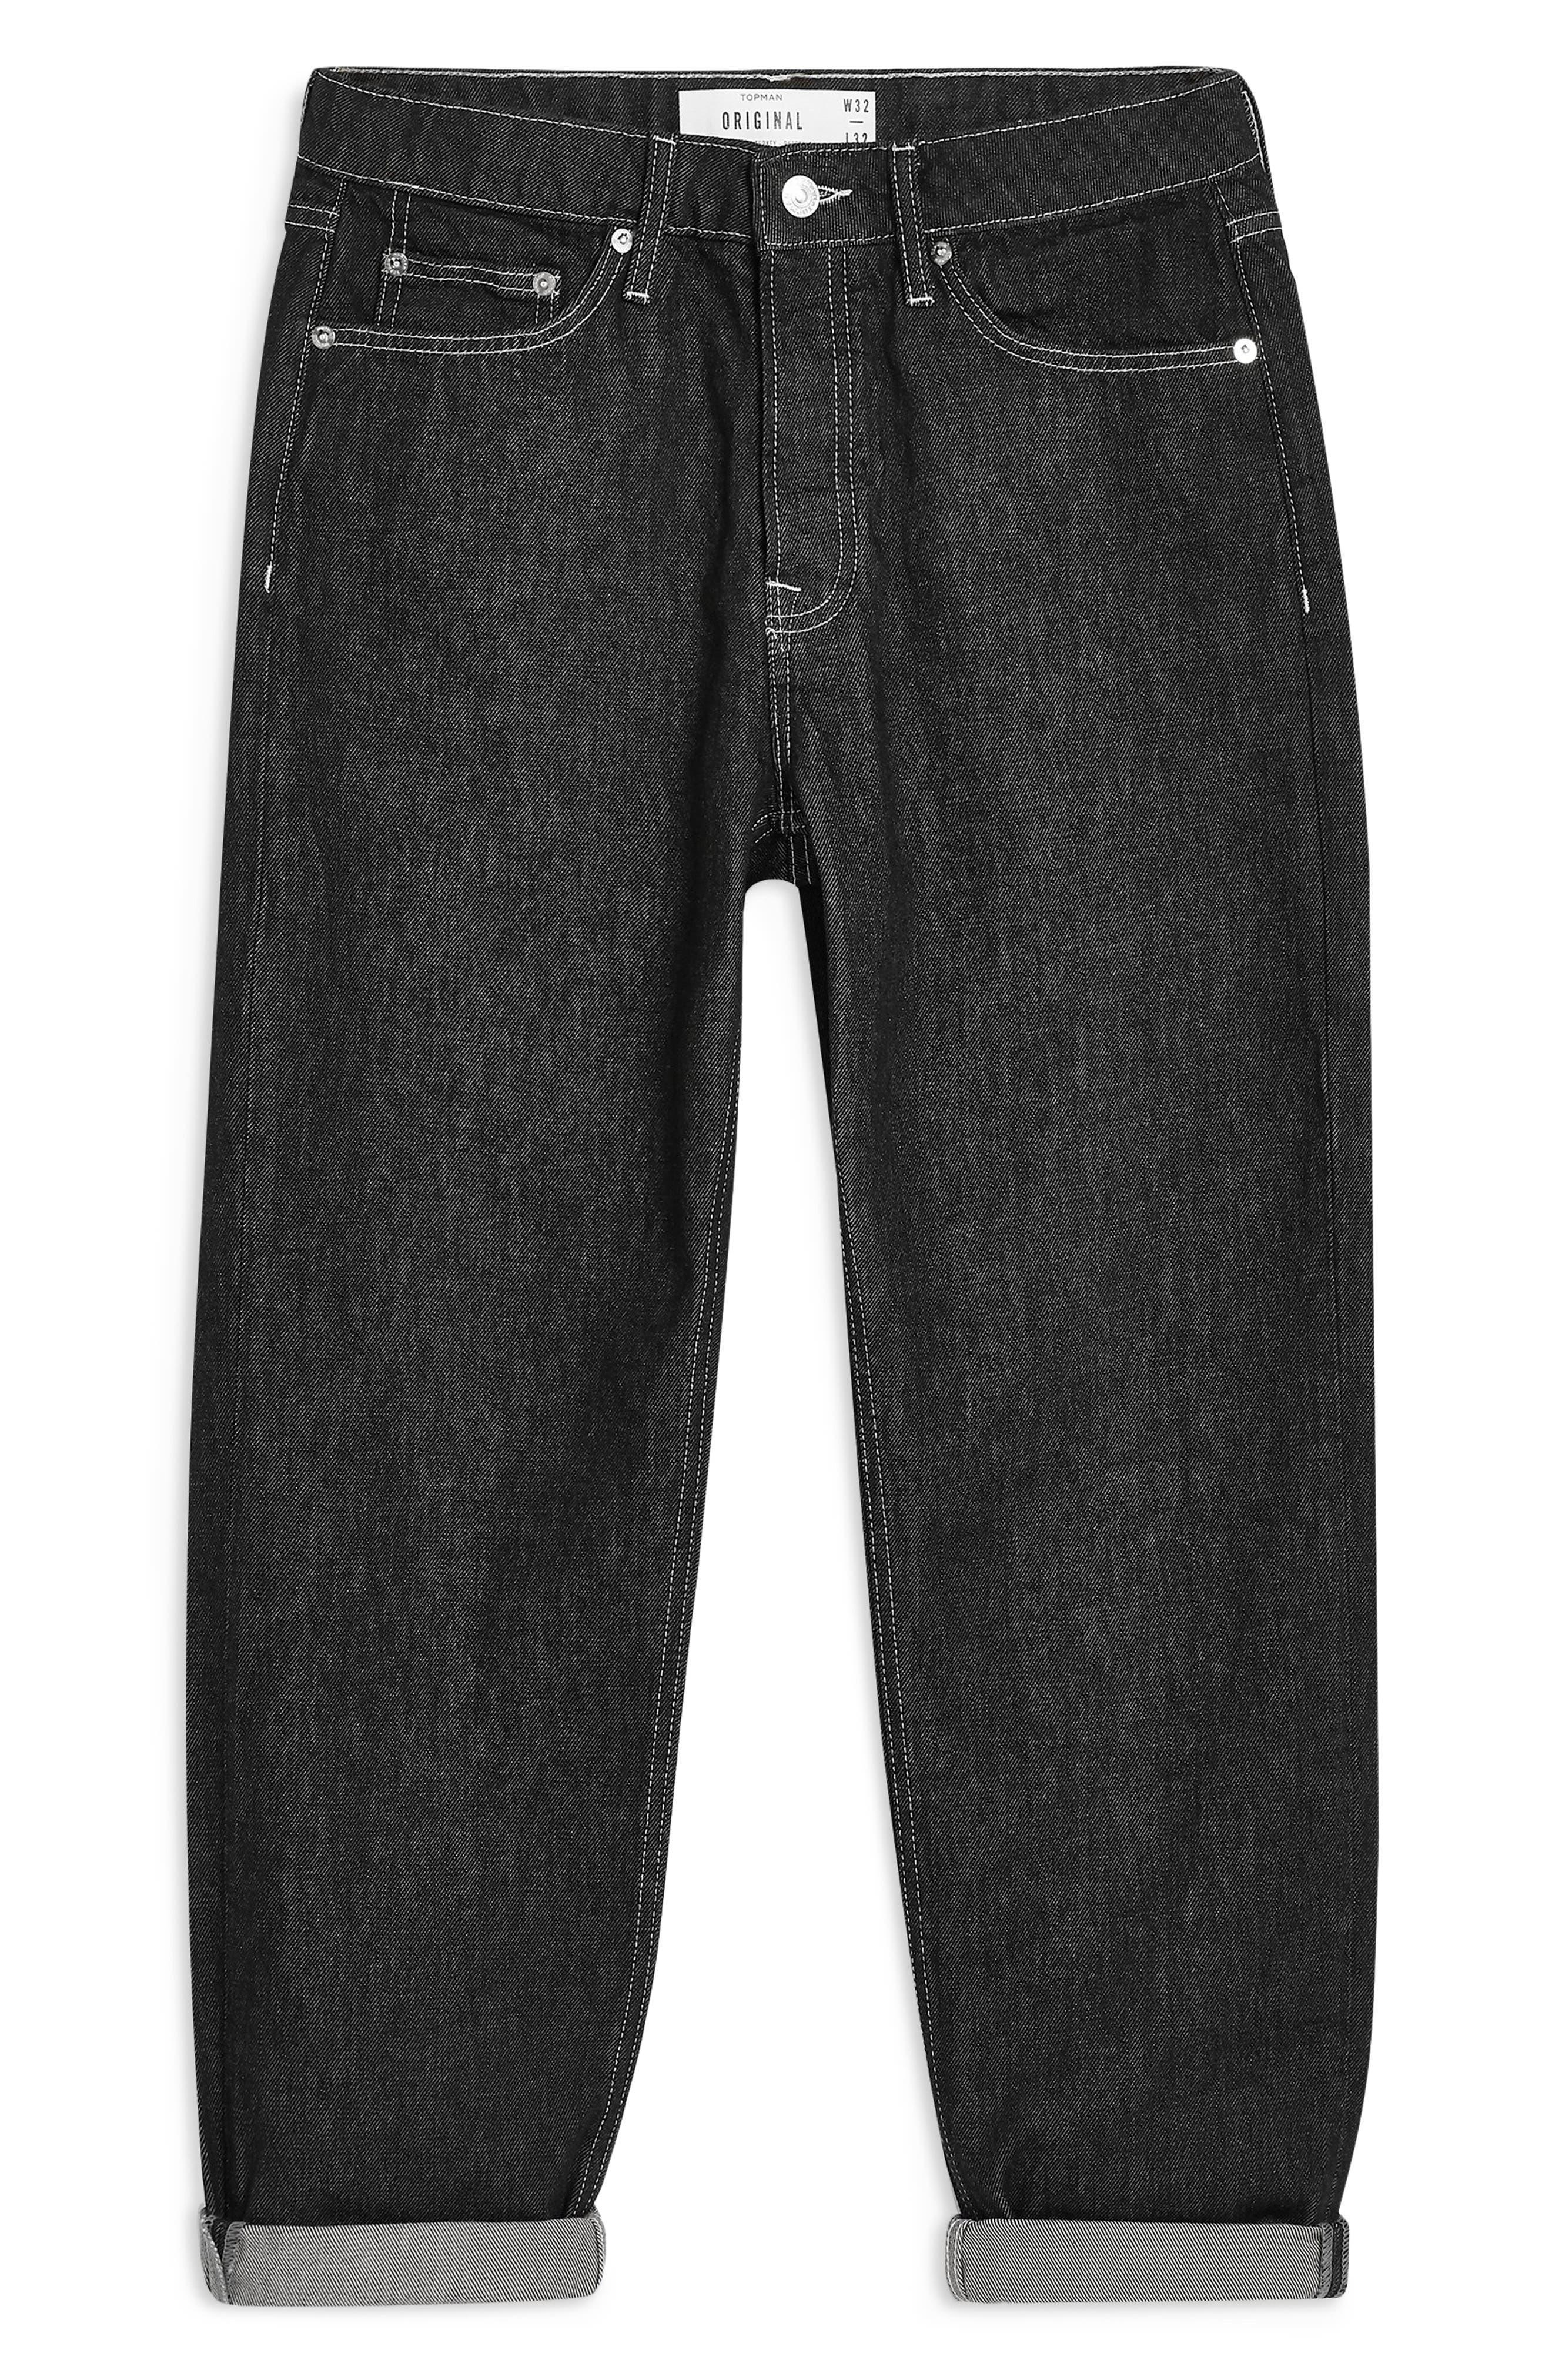 TOPMAN,                             Original Fit Jeans,                             Alternate thumbnail 4, color,                             BLACK